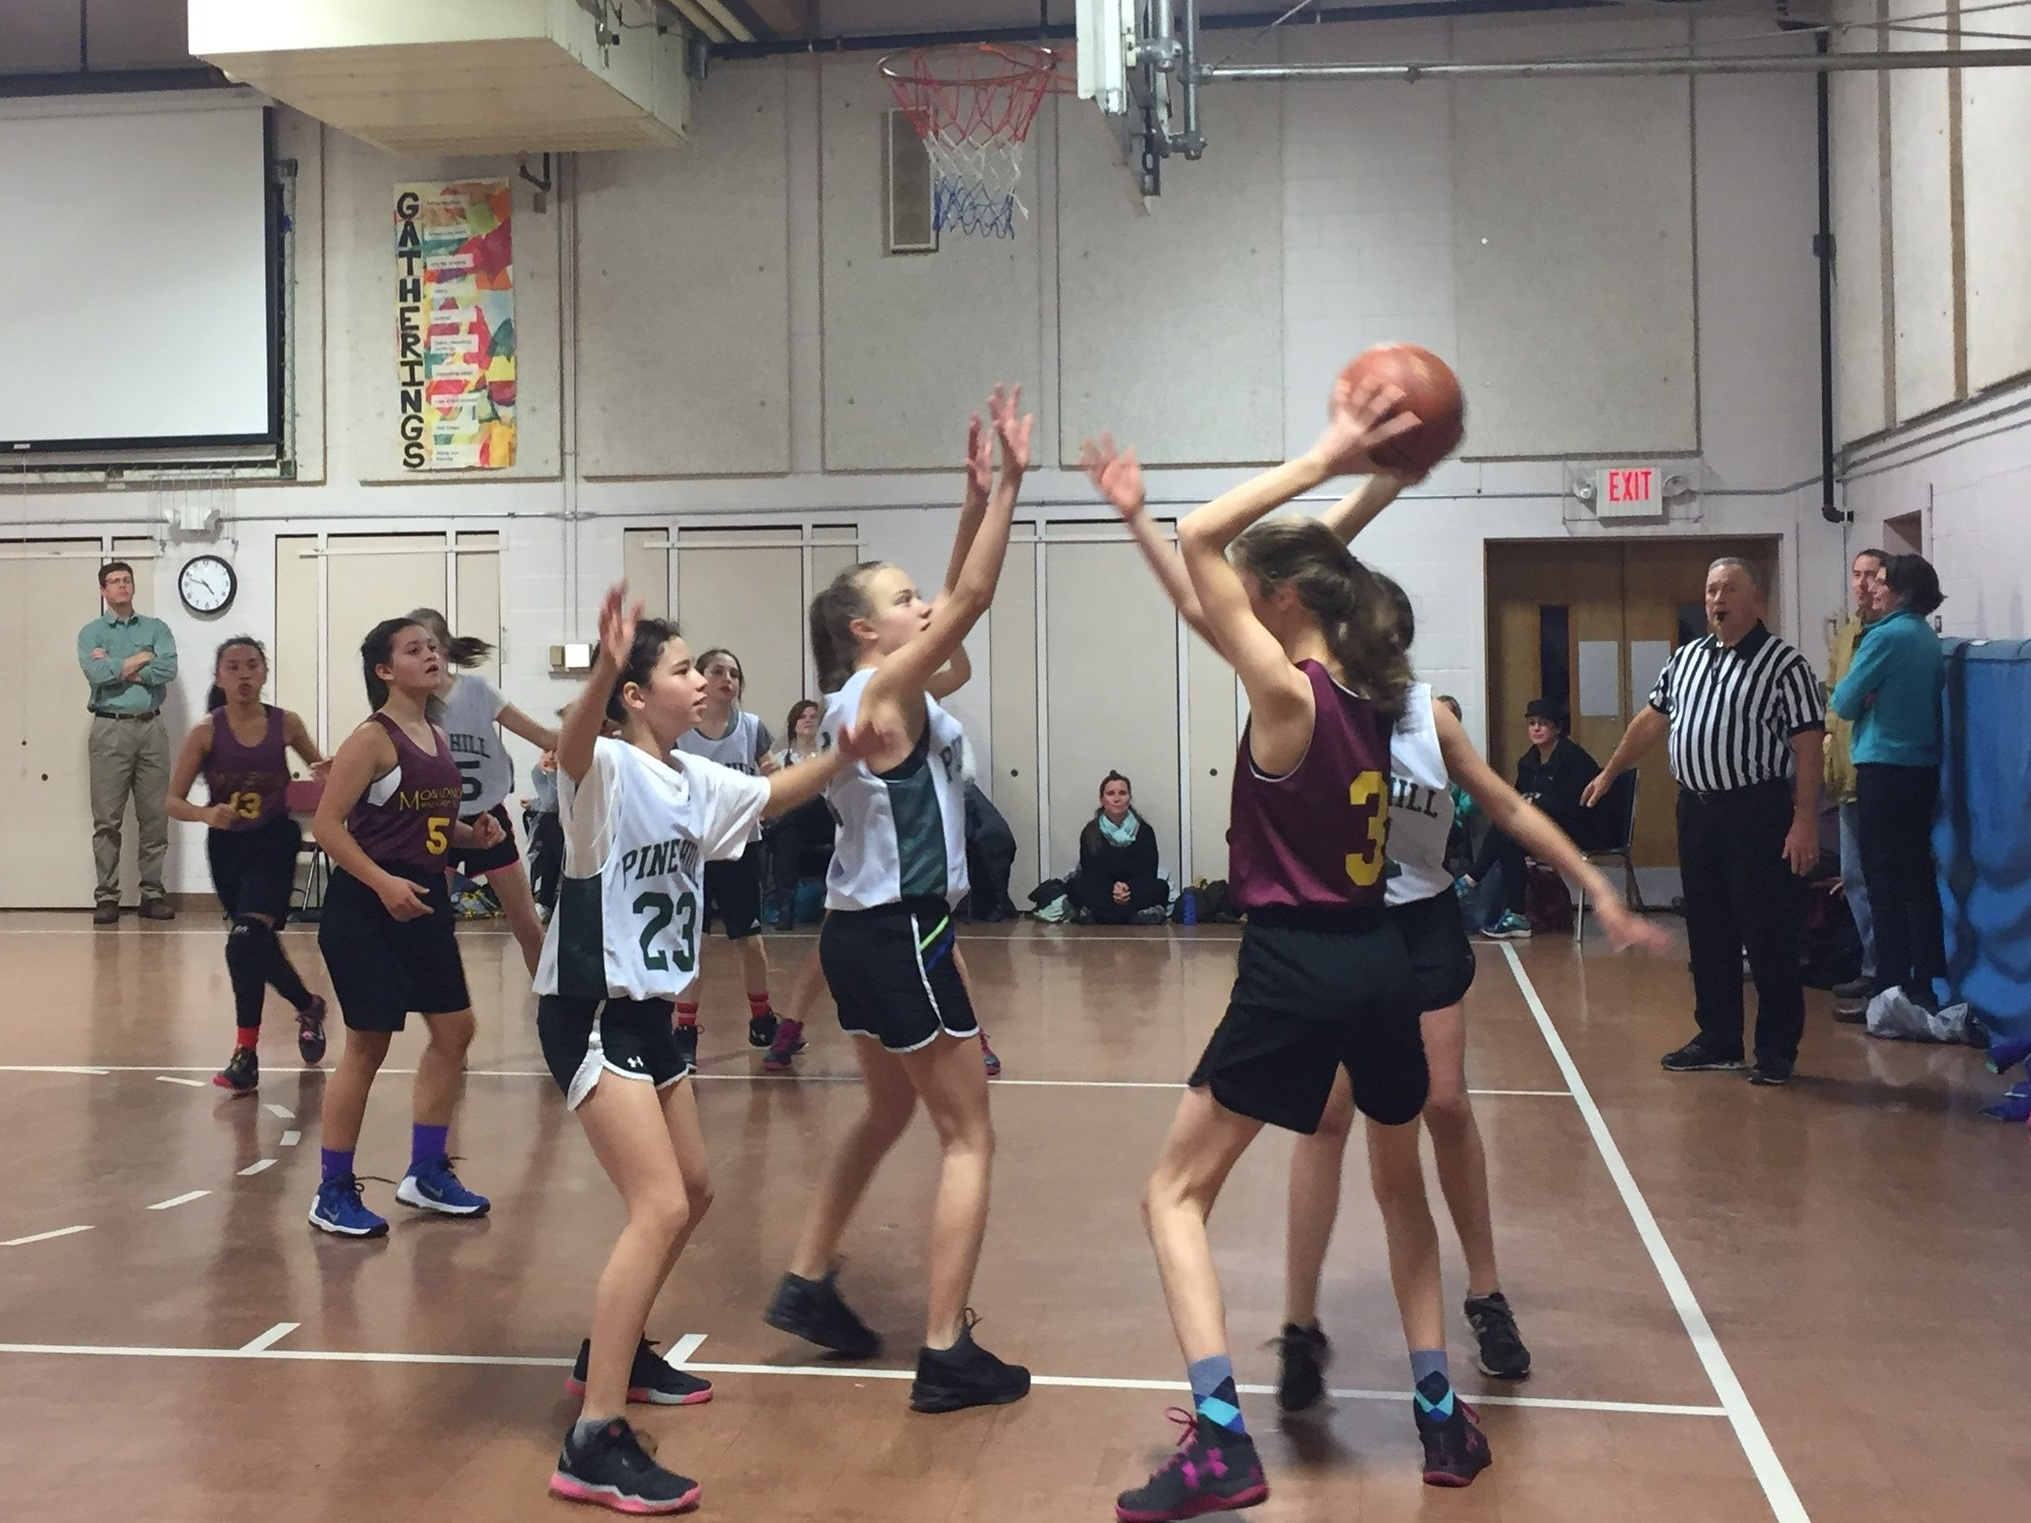 MonadnockWaldorf_GS_basketball.jpg